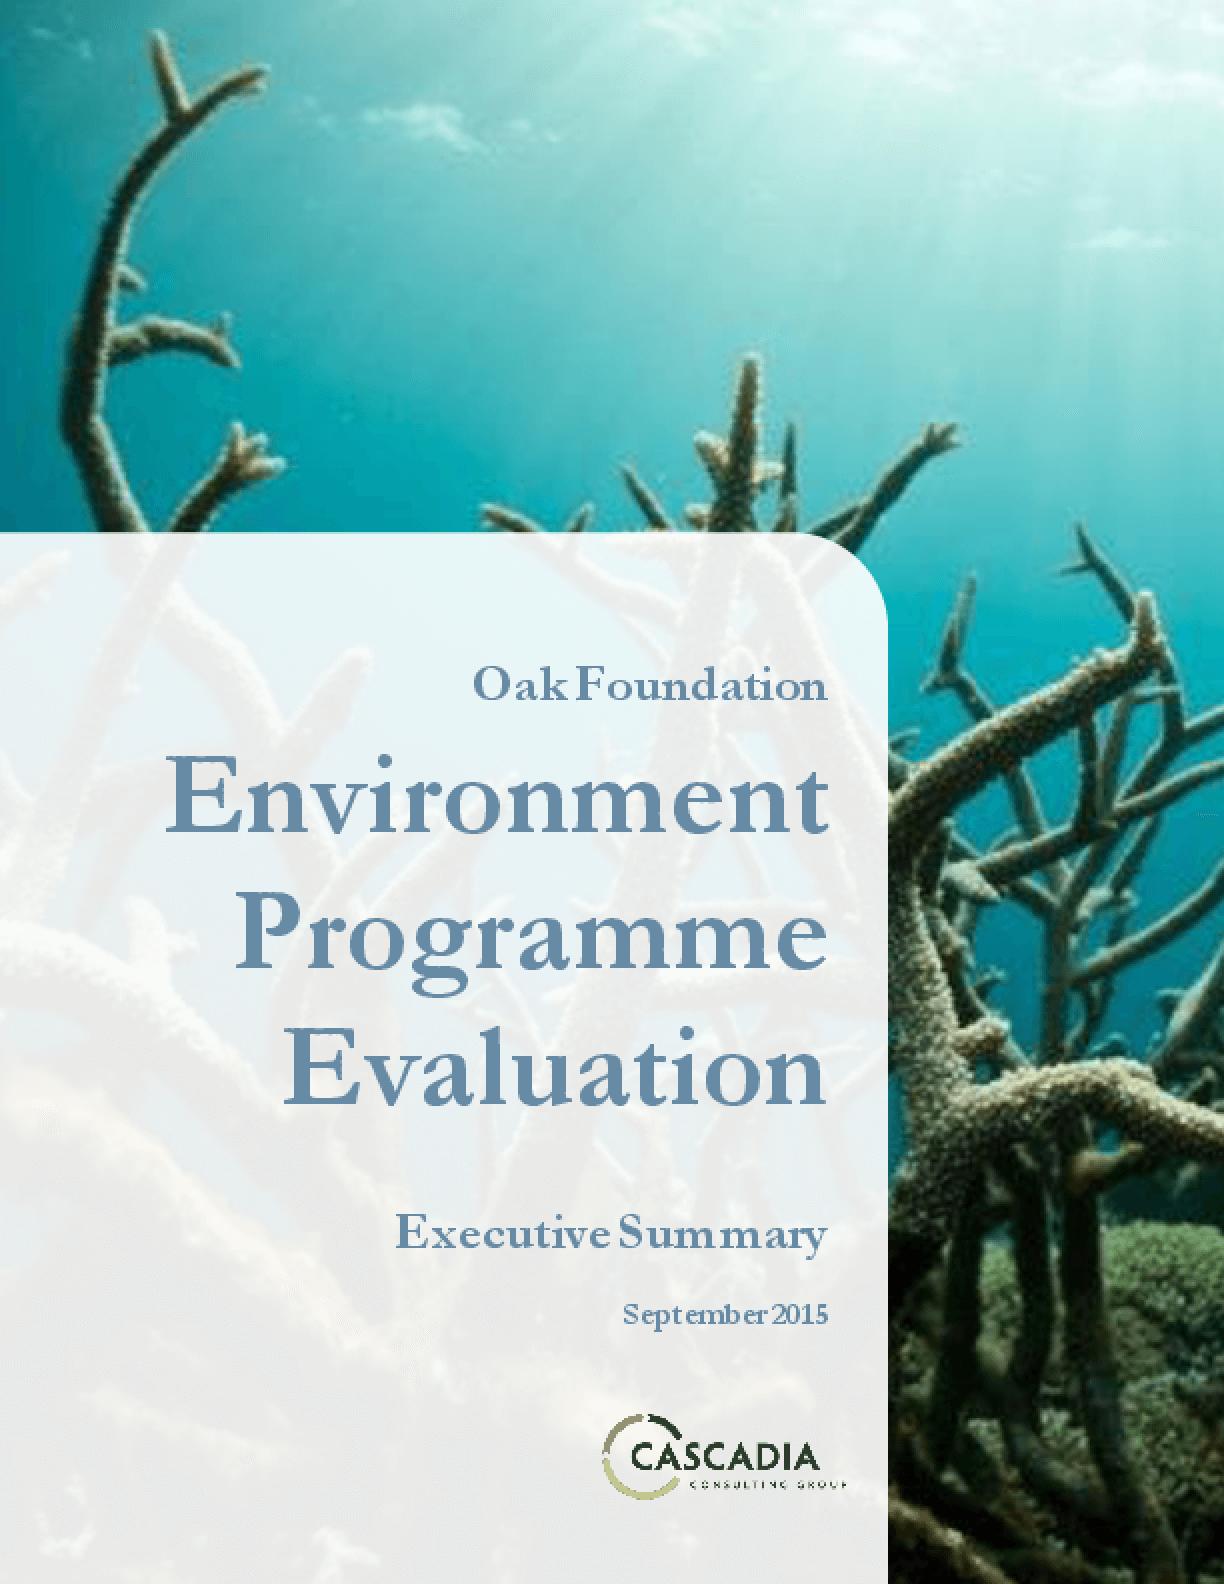 Oak Foundation Environment Programme Evaluation: Executive Summary